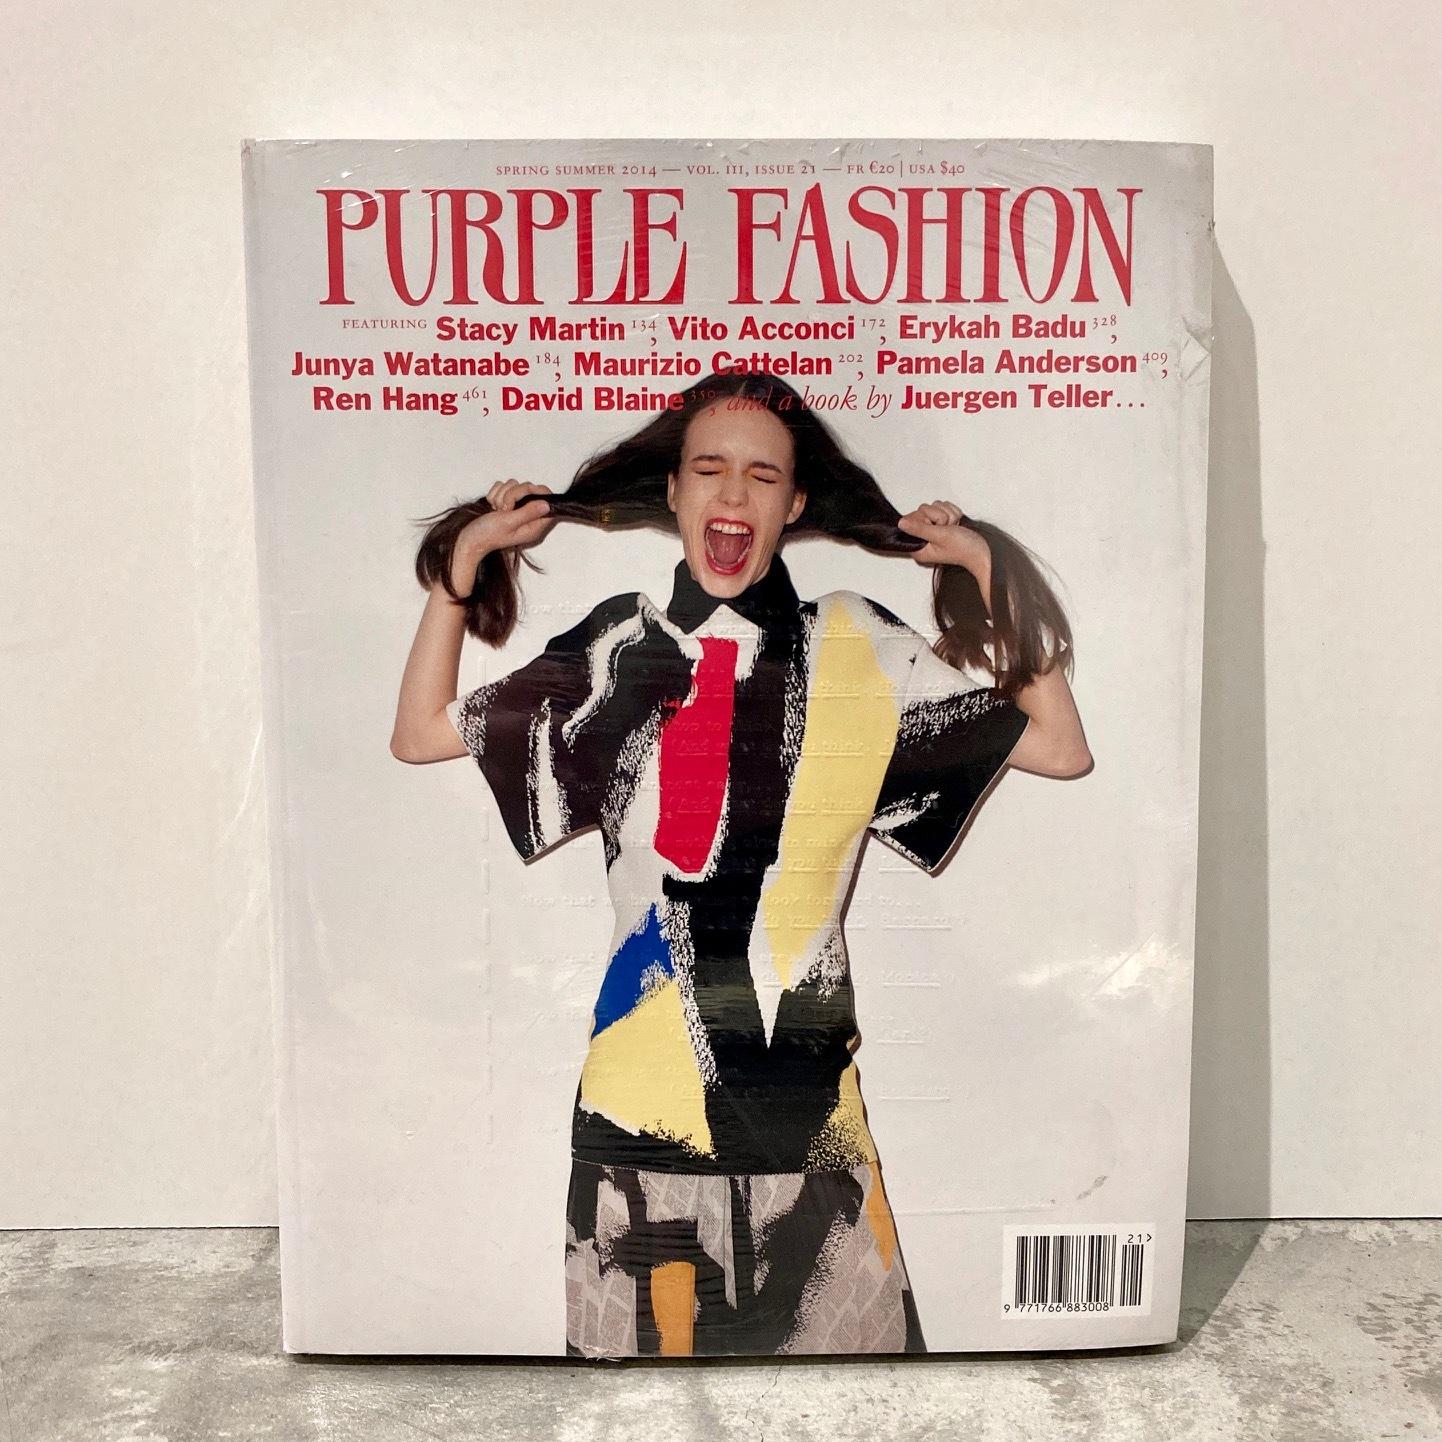 BOOK / PURPLE FASHION  magazine S/S 2014 Issue 21